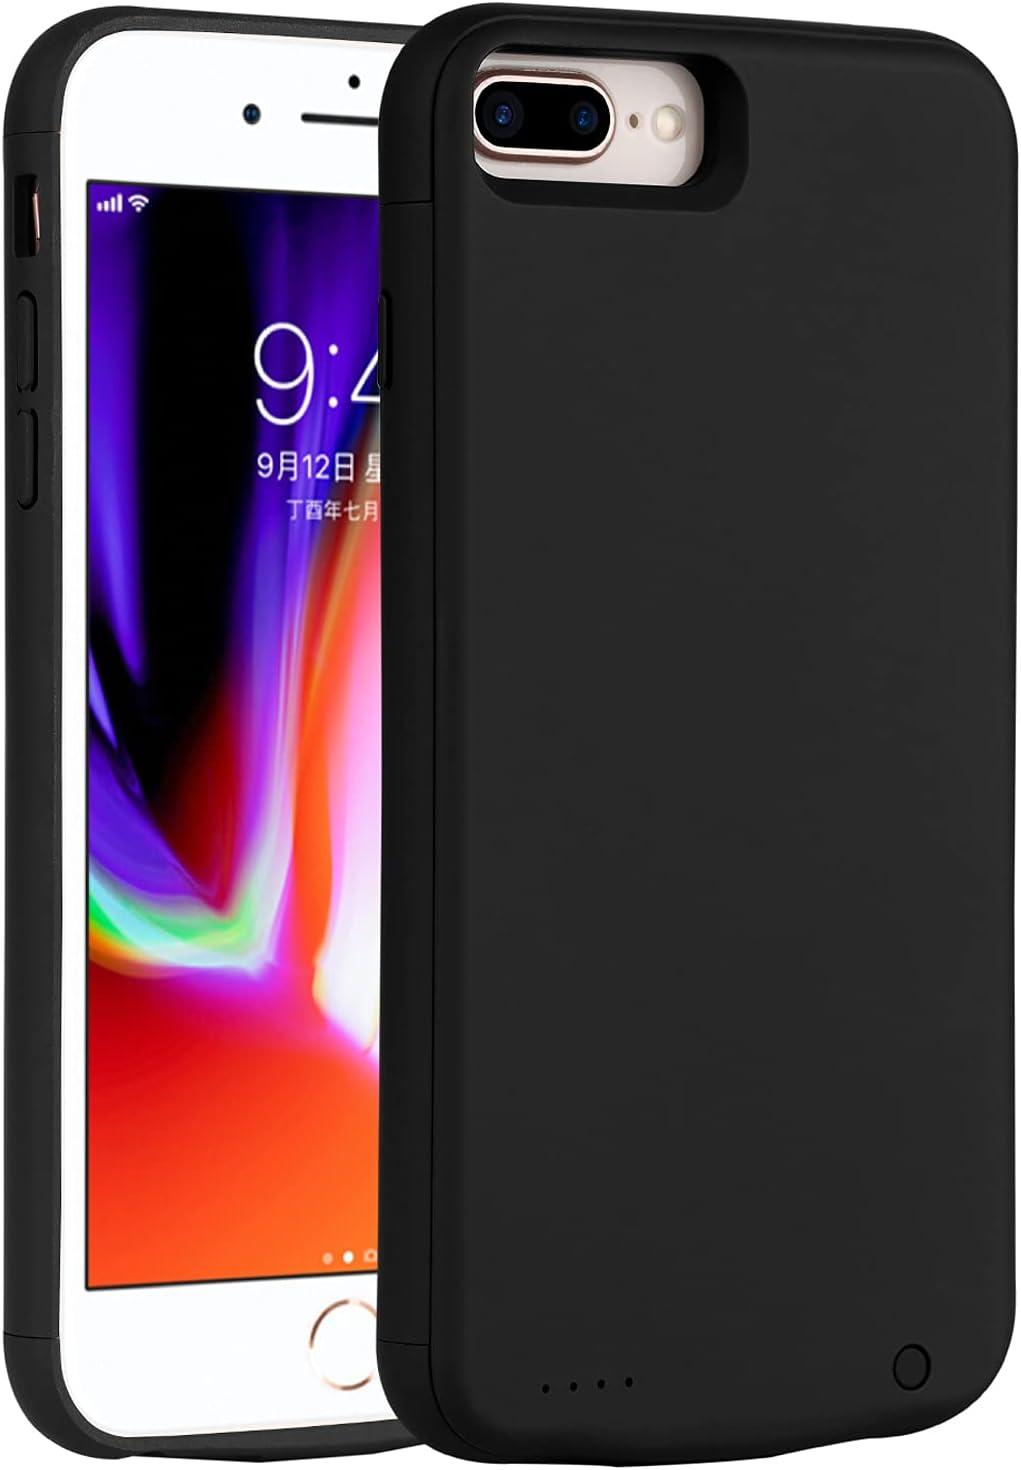 Battery Case for iPhone 8 Plus 7 Plus 6/6s Plus, 7000mAh Slim Charging Case Extend 160% Battery Life, Portable Charger Case Compatible iPhone 8P/7P/6P/6SP(5.5 inch Black)